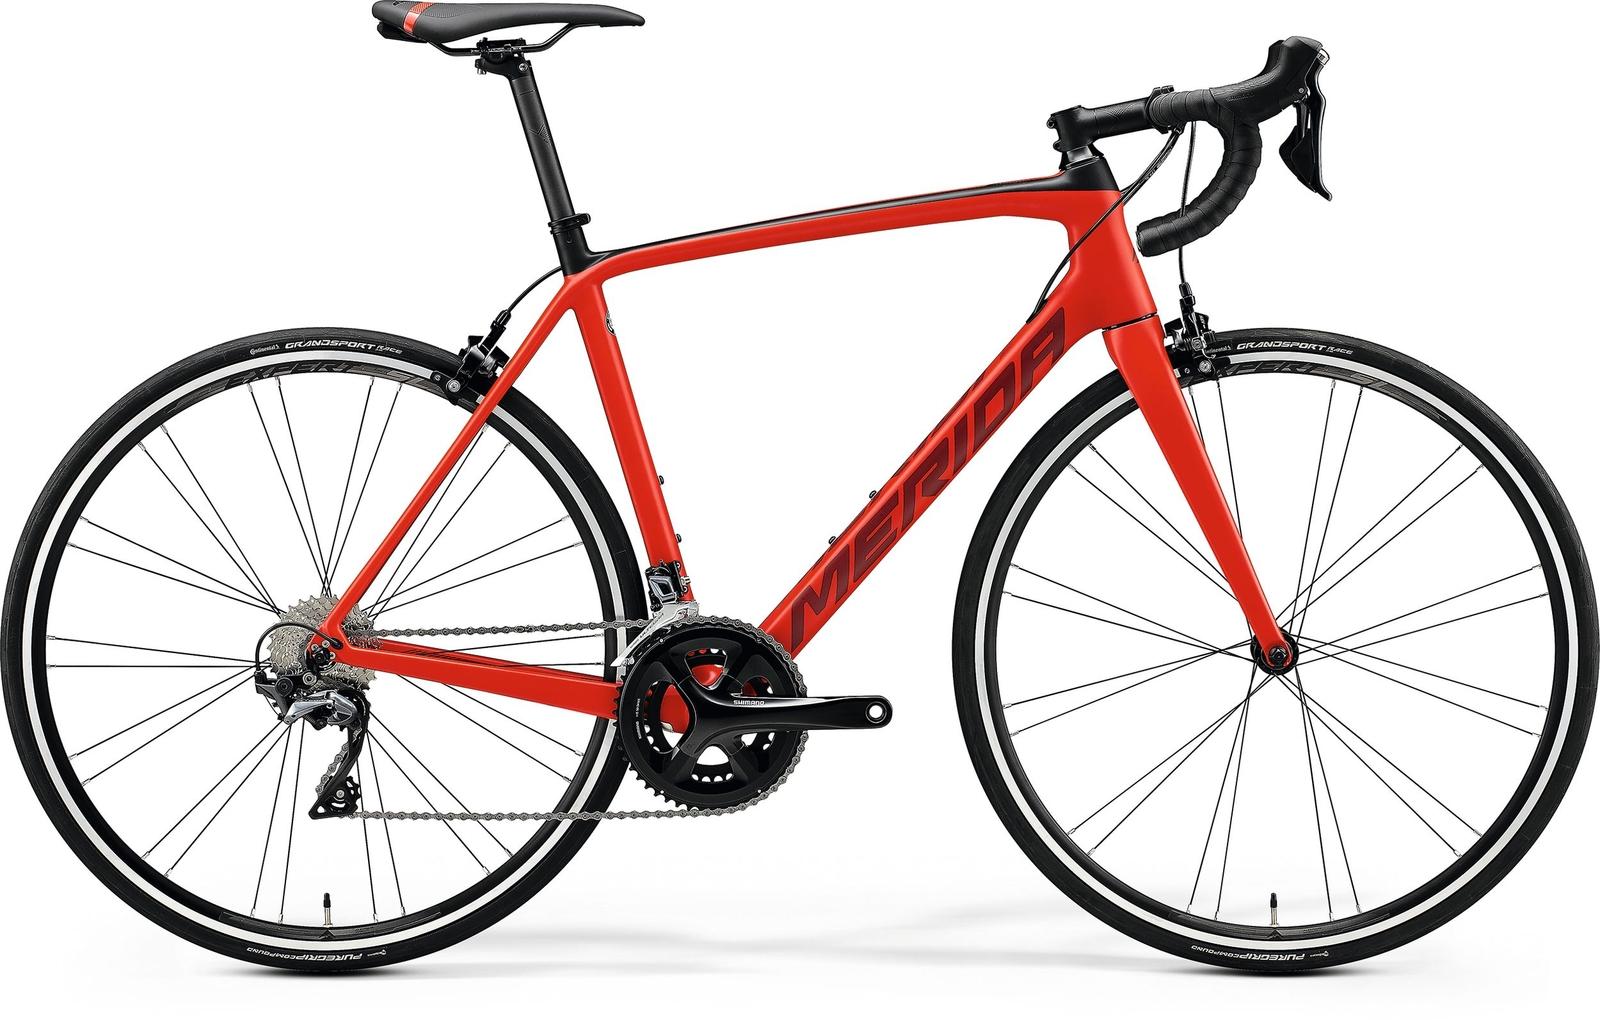 Bicicleta de sosea Merida Scultura 5000 Rosu/Negru 2020 imagine